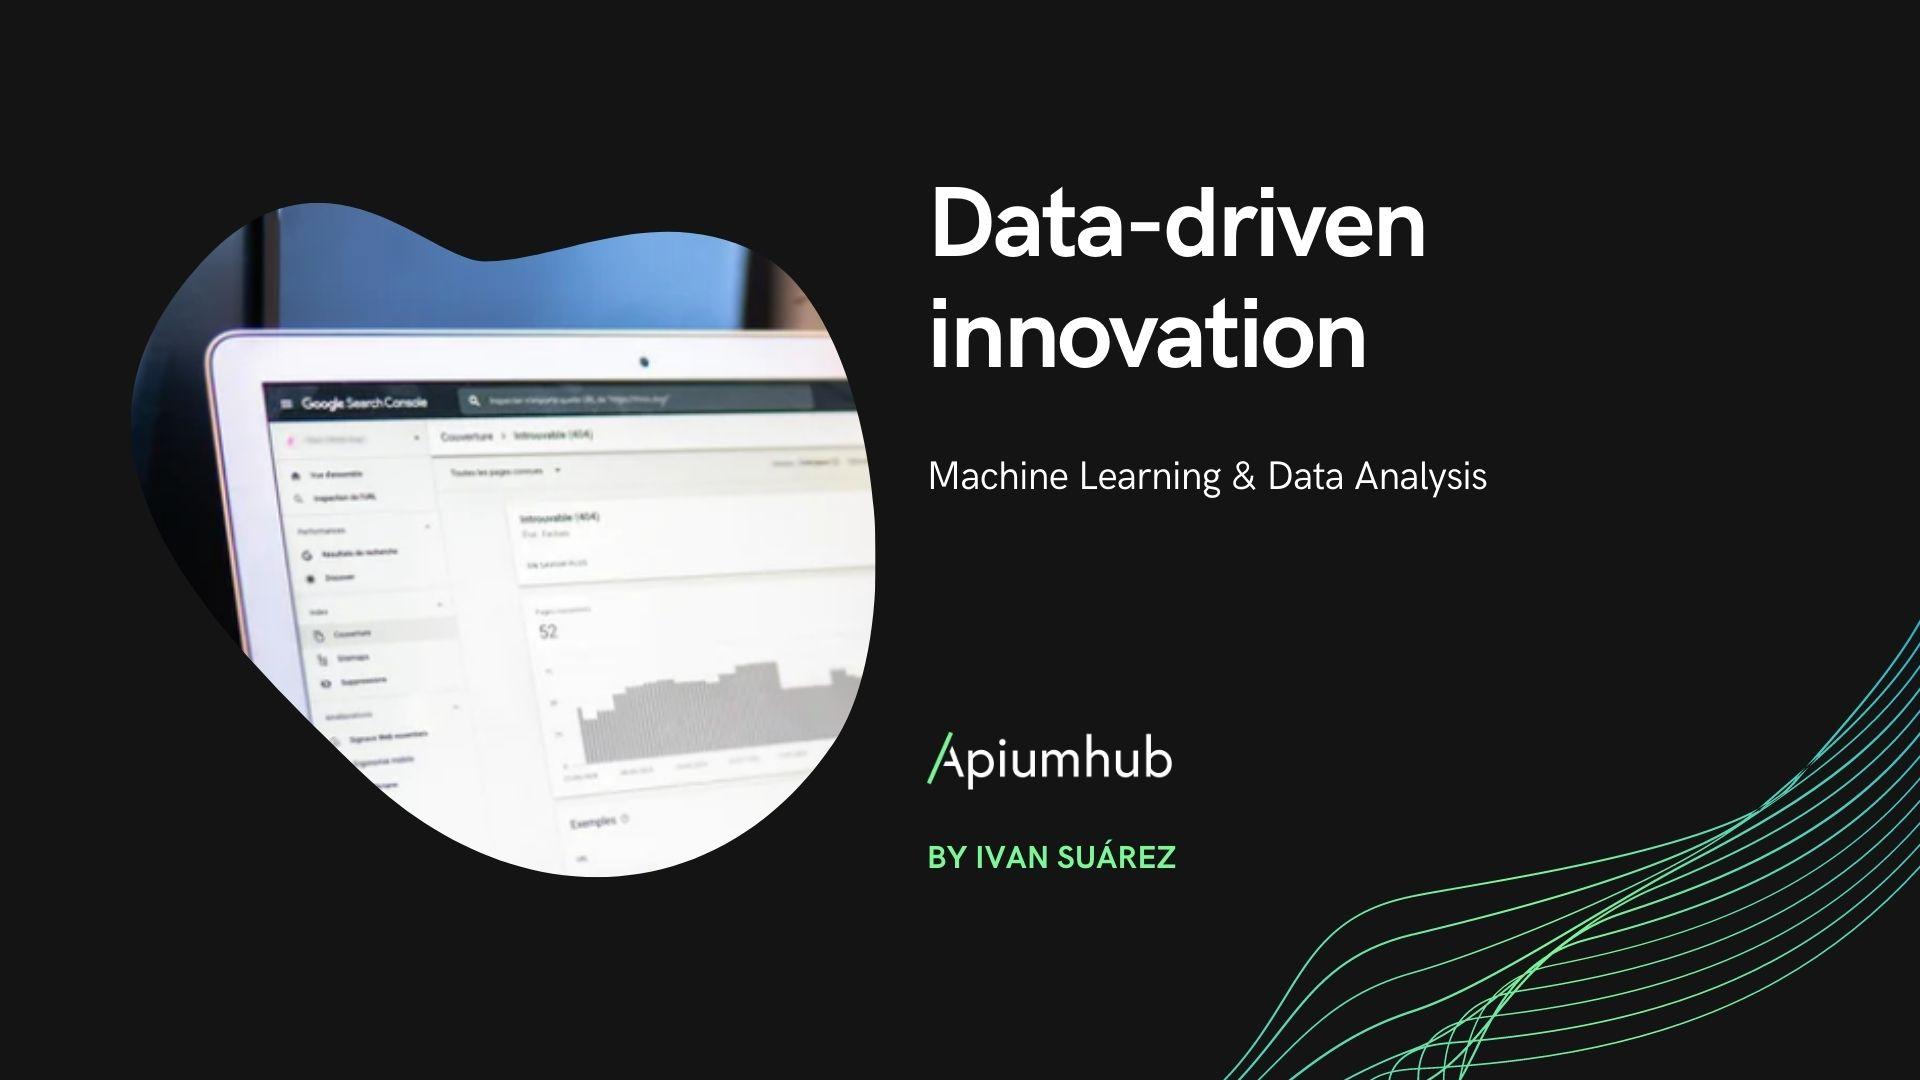 datainnovation